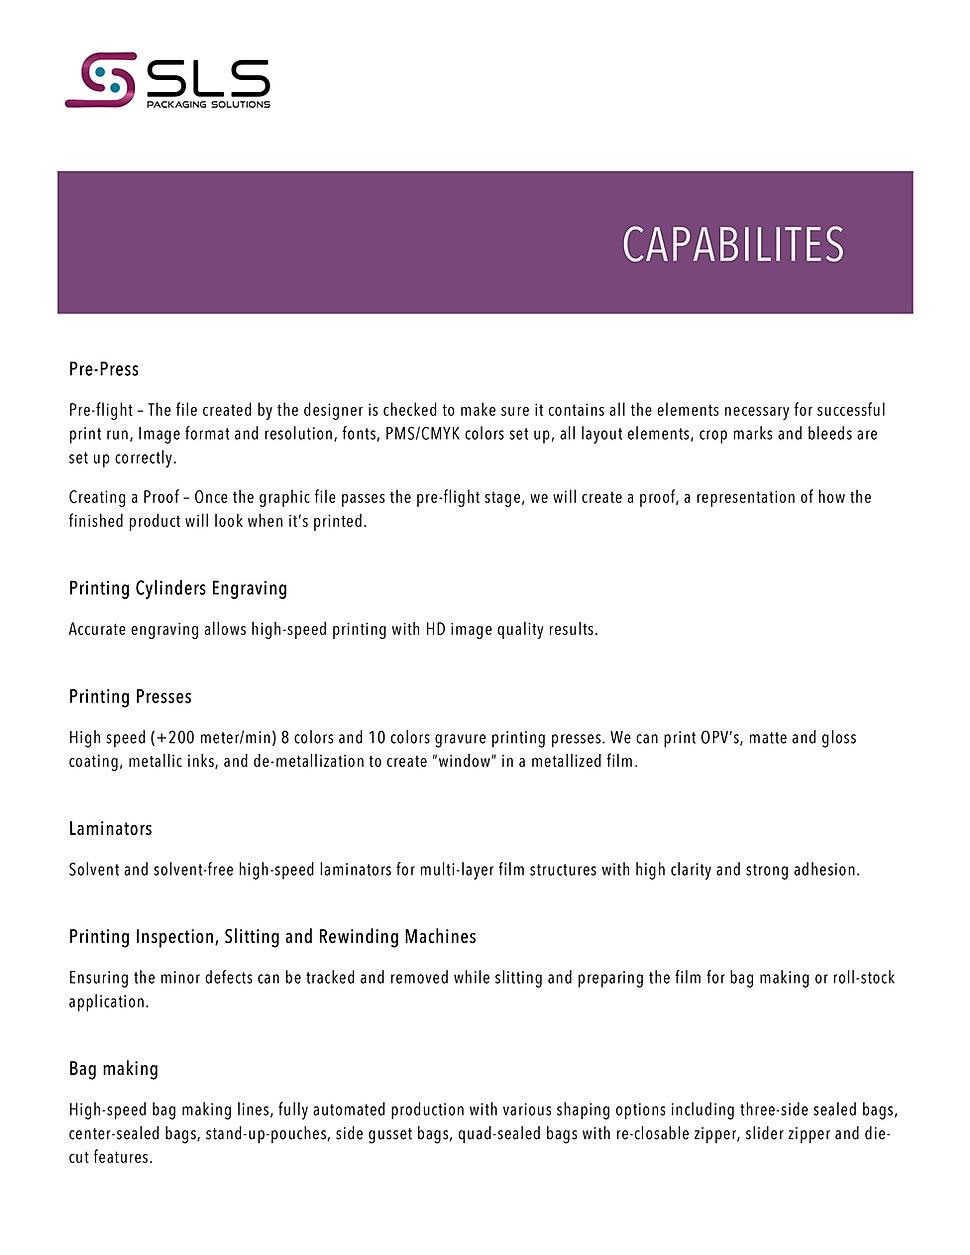 SLS-Packaging-Solutions-brochure-final-6